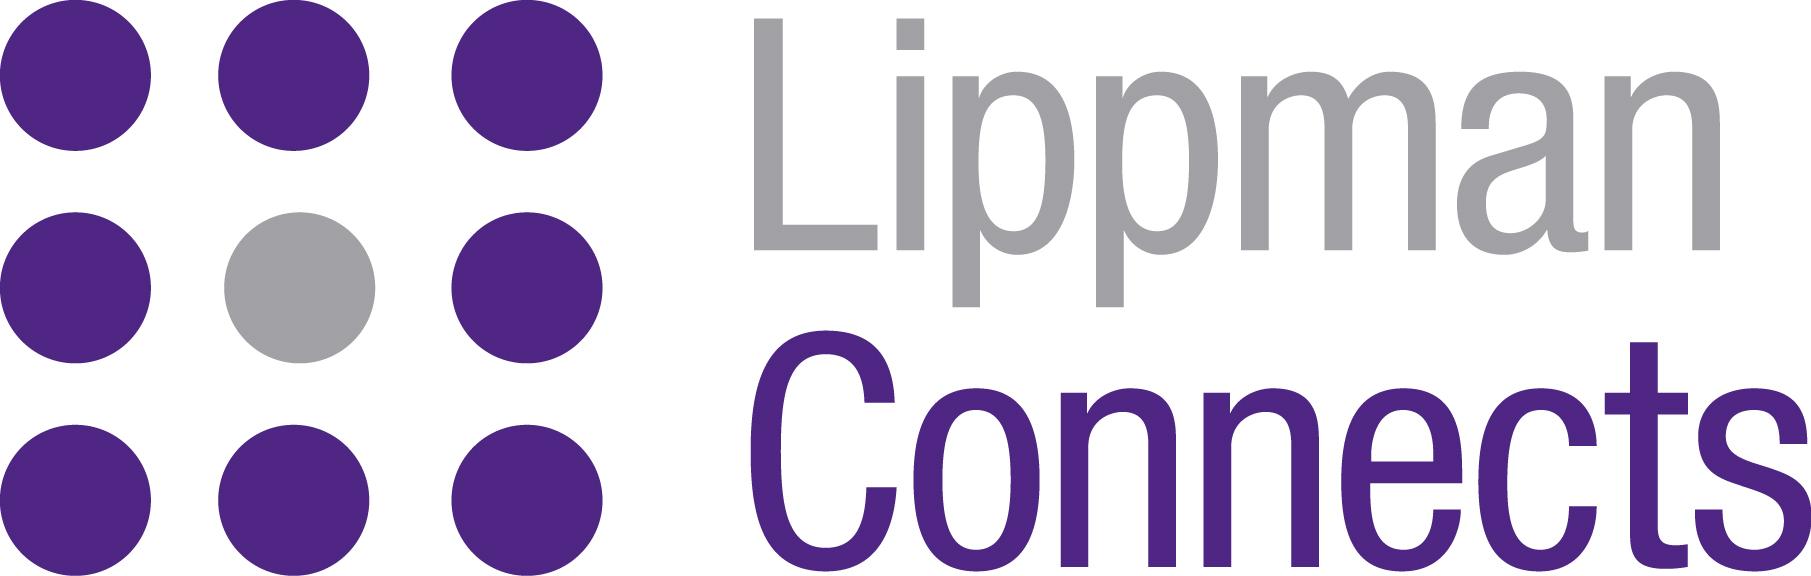 LippmanConnects_logo